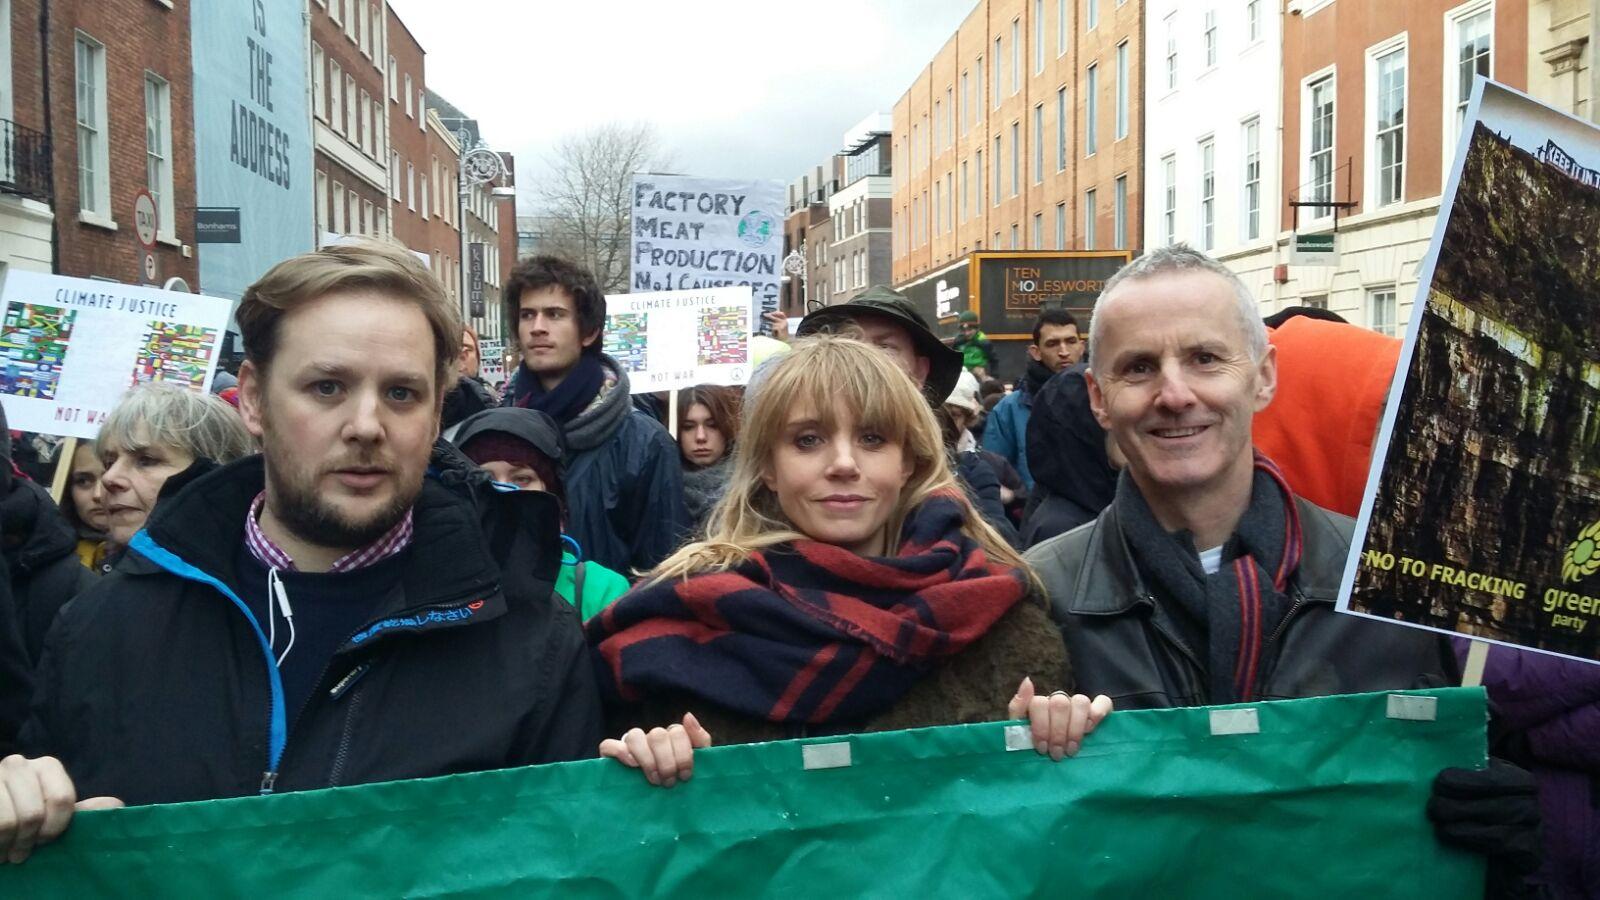 Climate-March-Patrick-Ciaran-Me.jpg